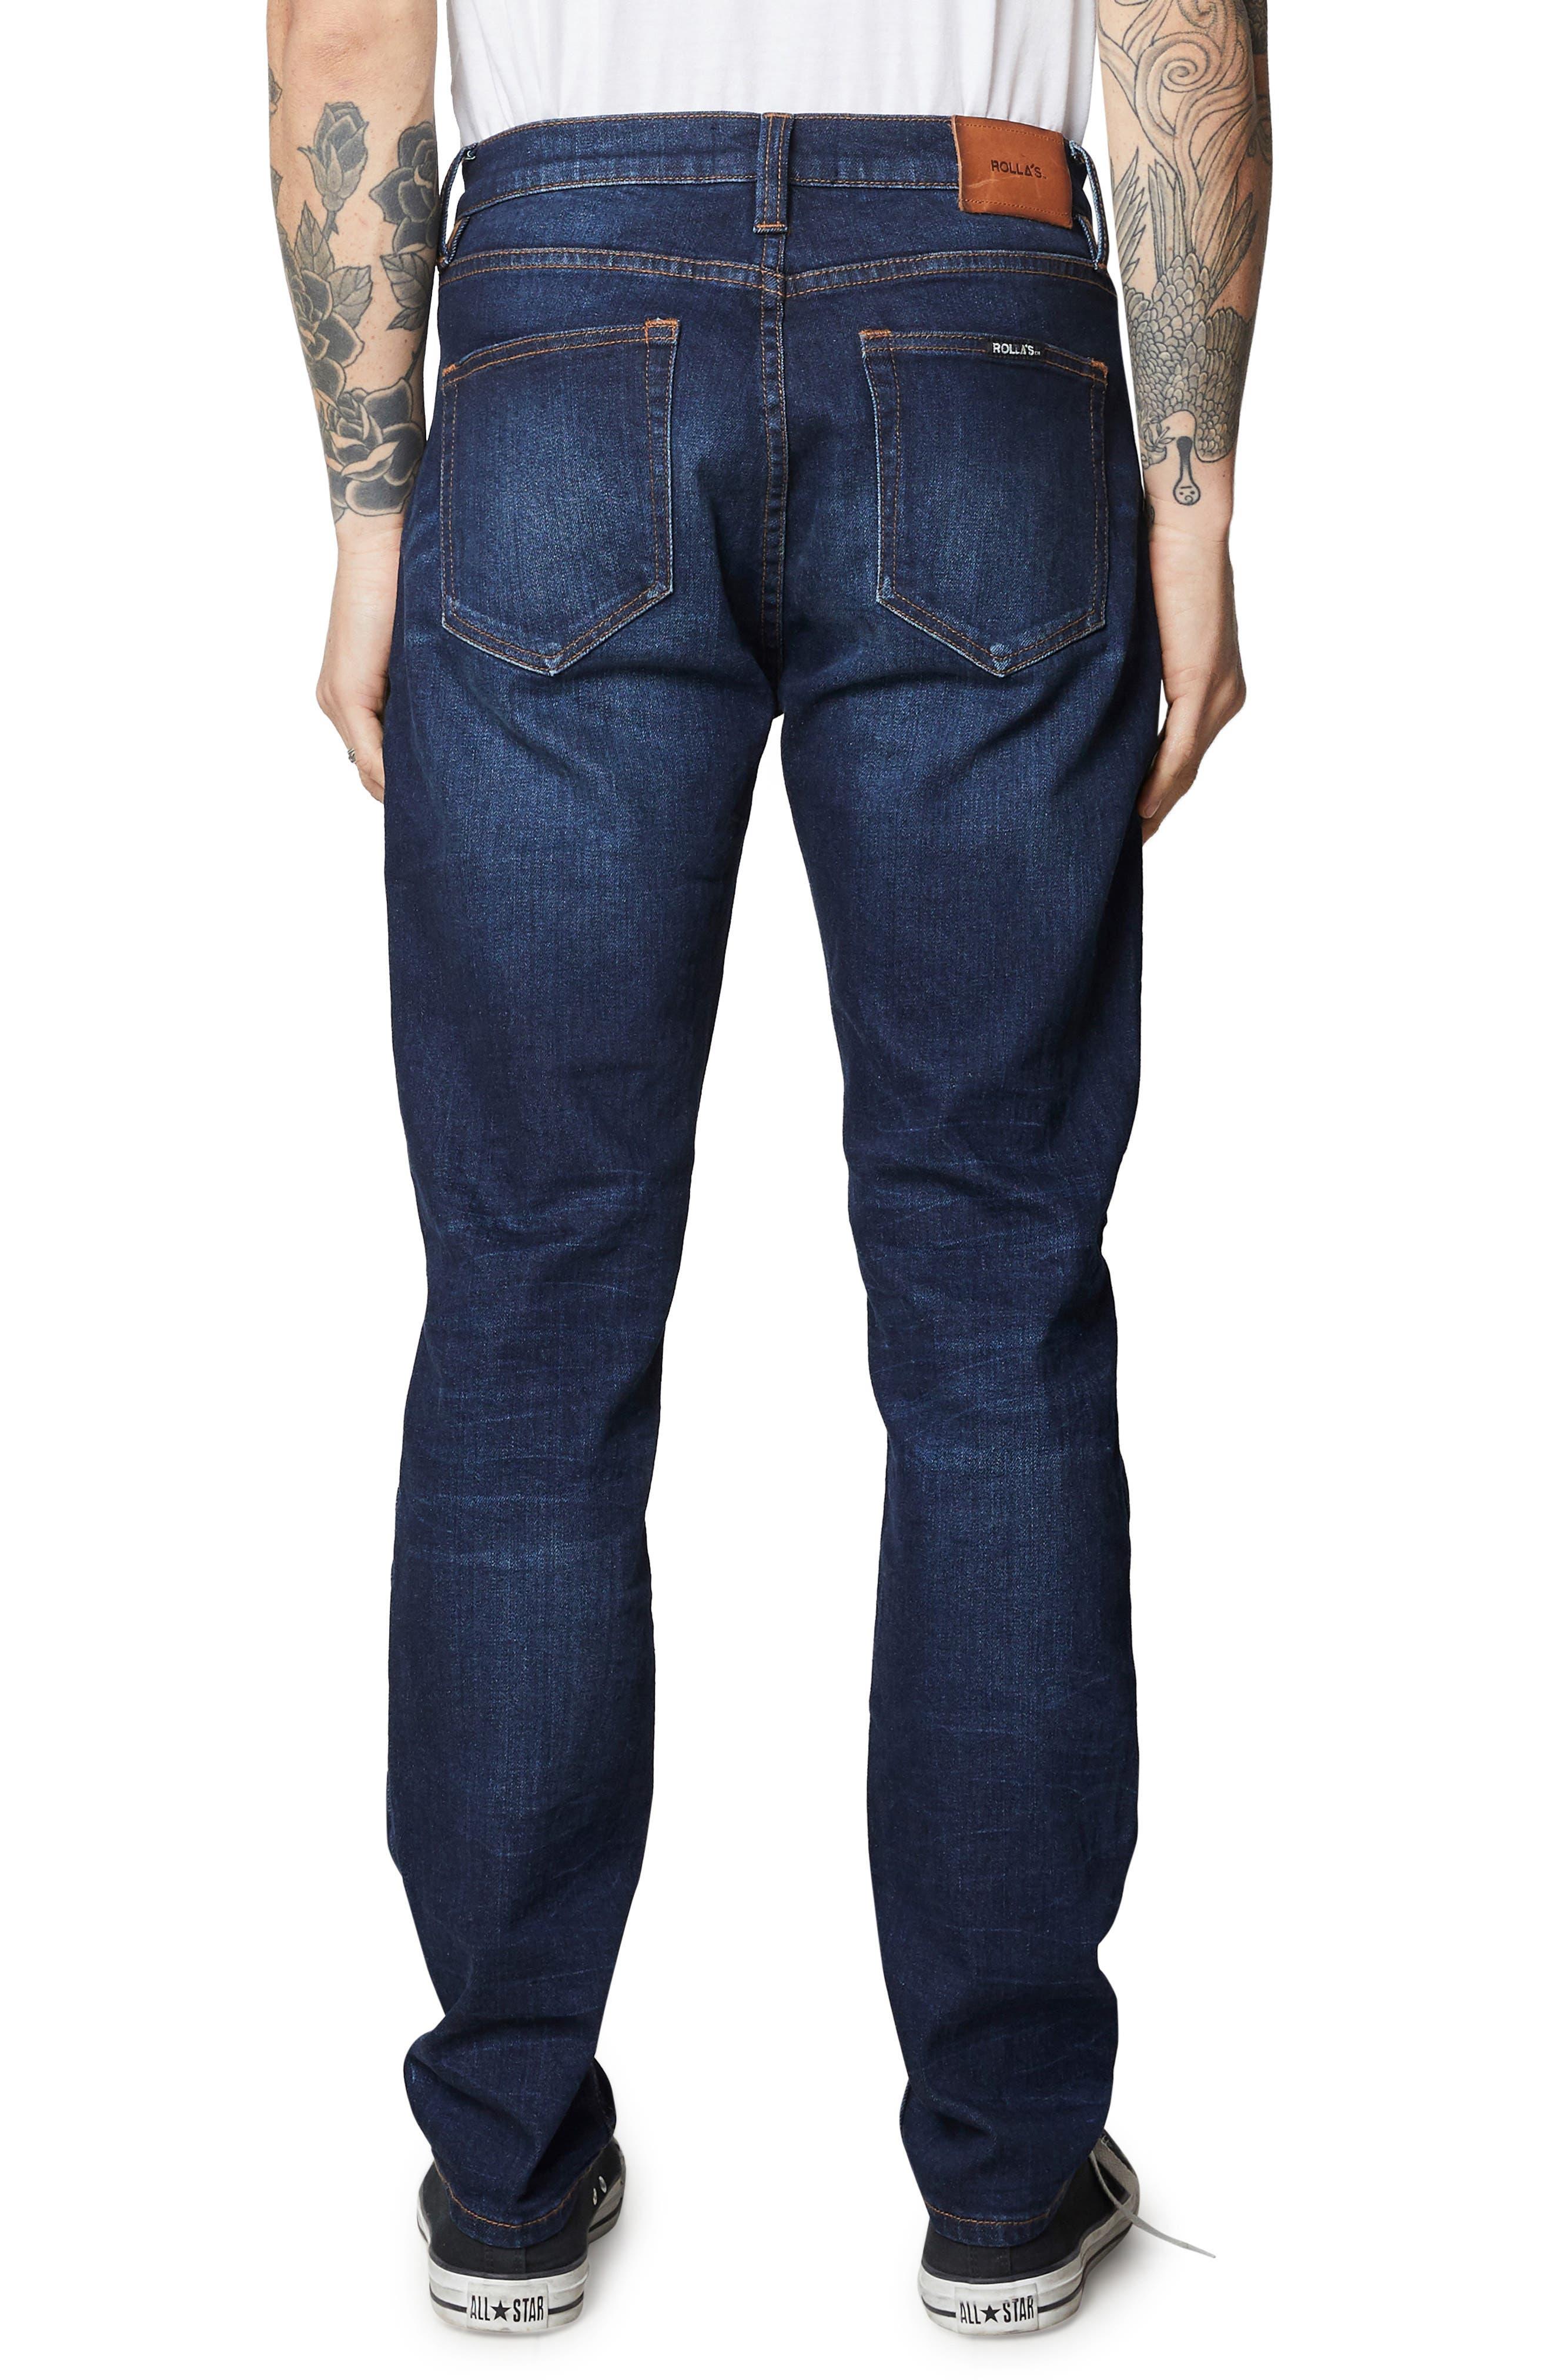 ROLLA'S,                             Tim Slims Slim Fit Jeans,                             Alternate thumbnail 2, color,                             406